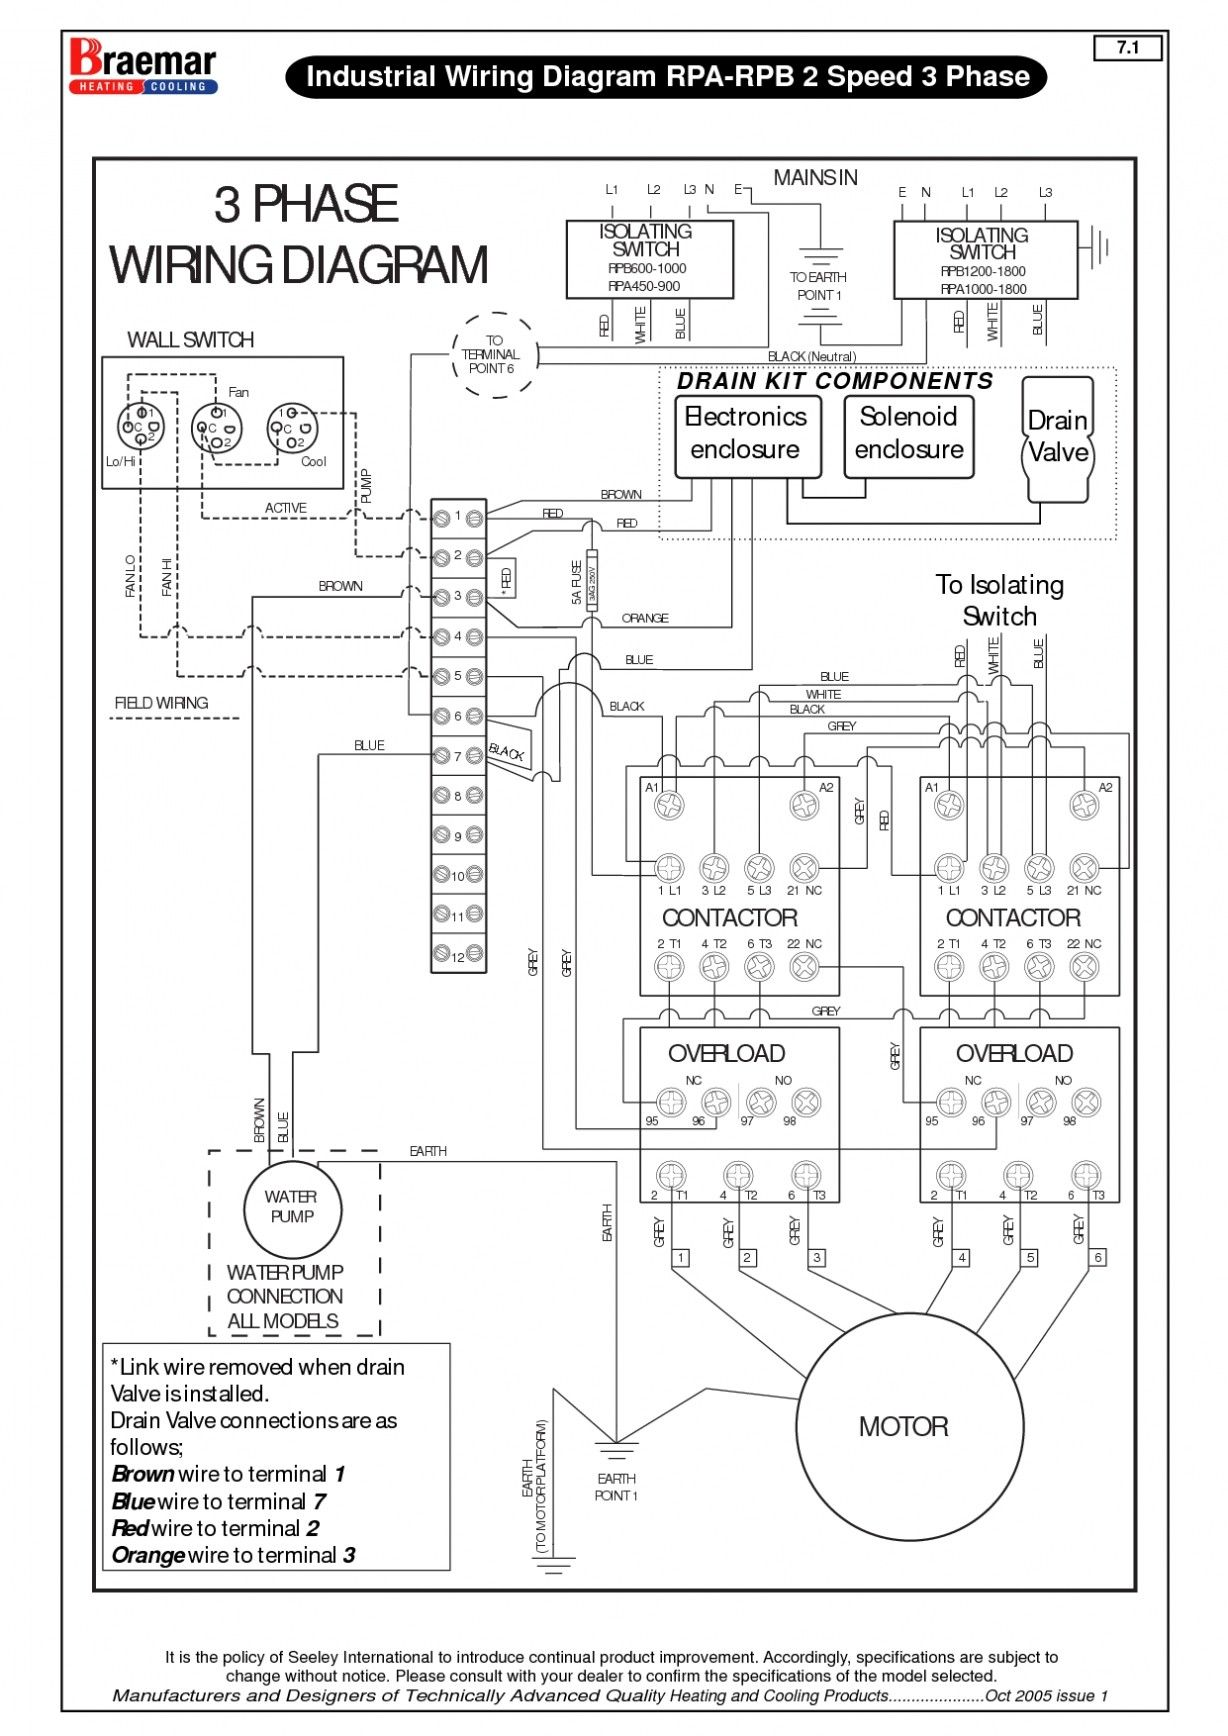 hight resolution of unique motor terminal connection diagram diagram wiringdiagram diagramming diagramm visuals visualisation graphical